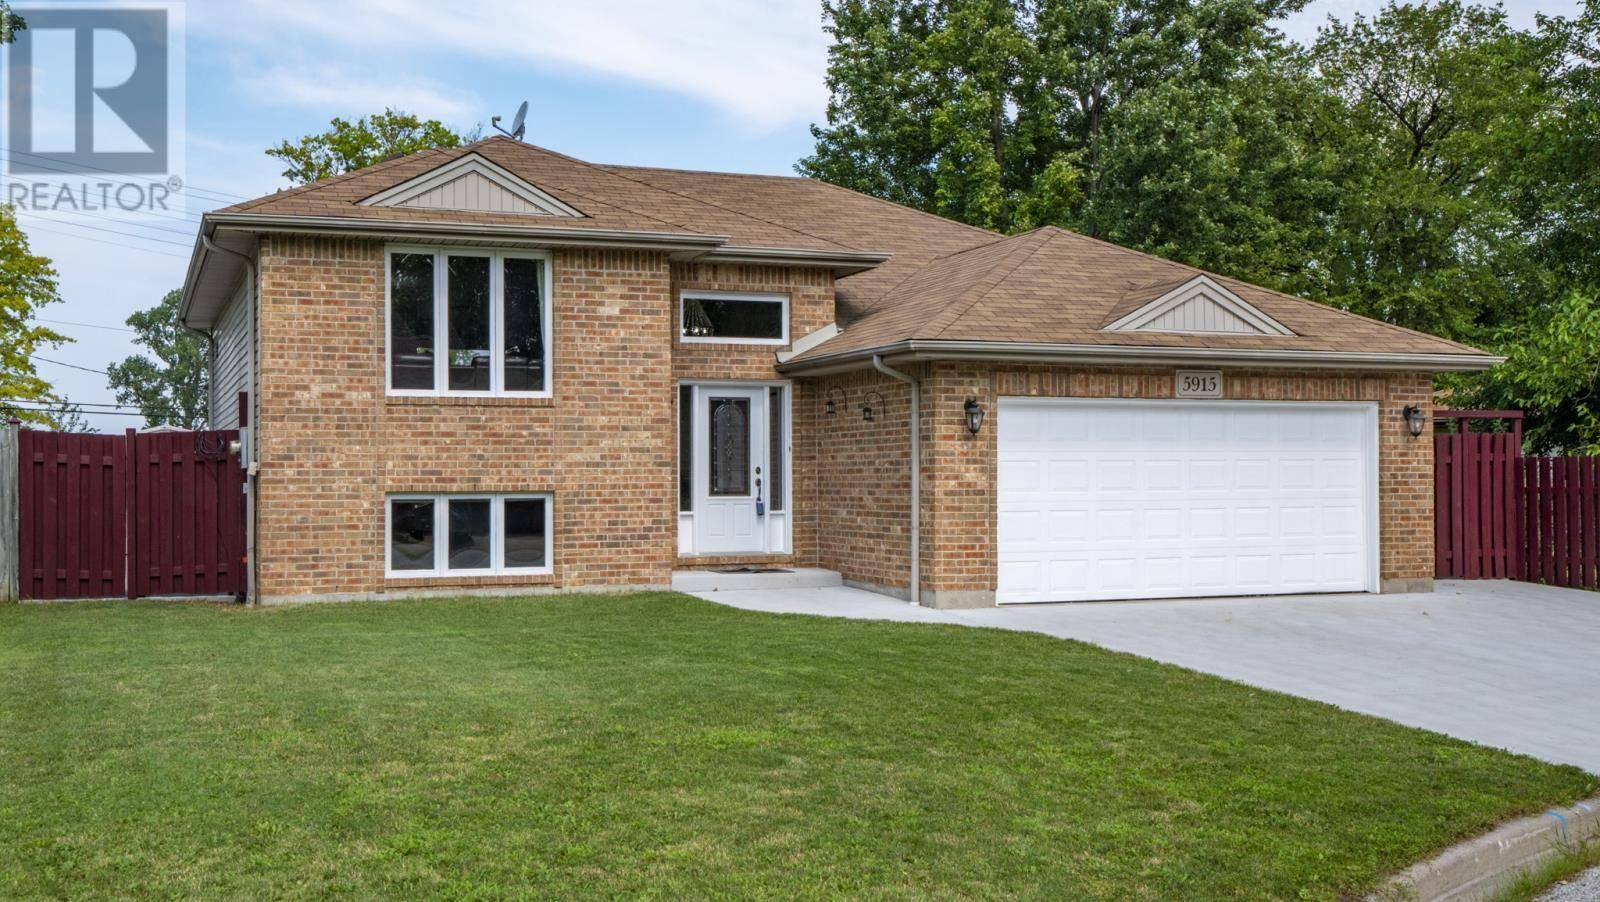 House for sale at 5915 Kingsley  Lasalle Ontario - MLS: 19028052